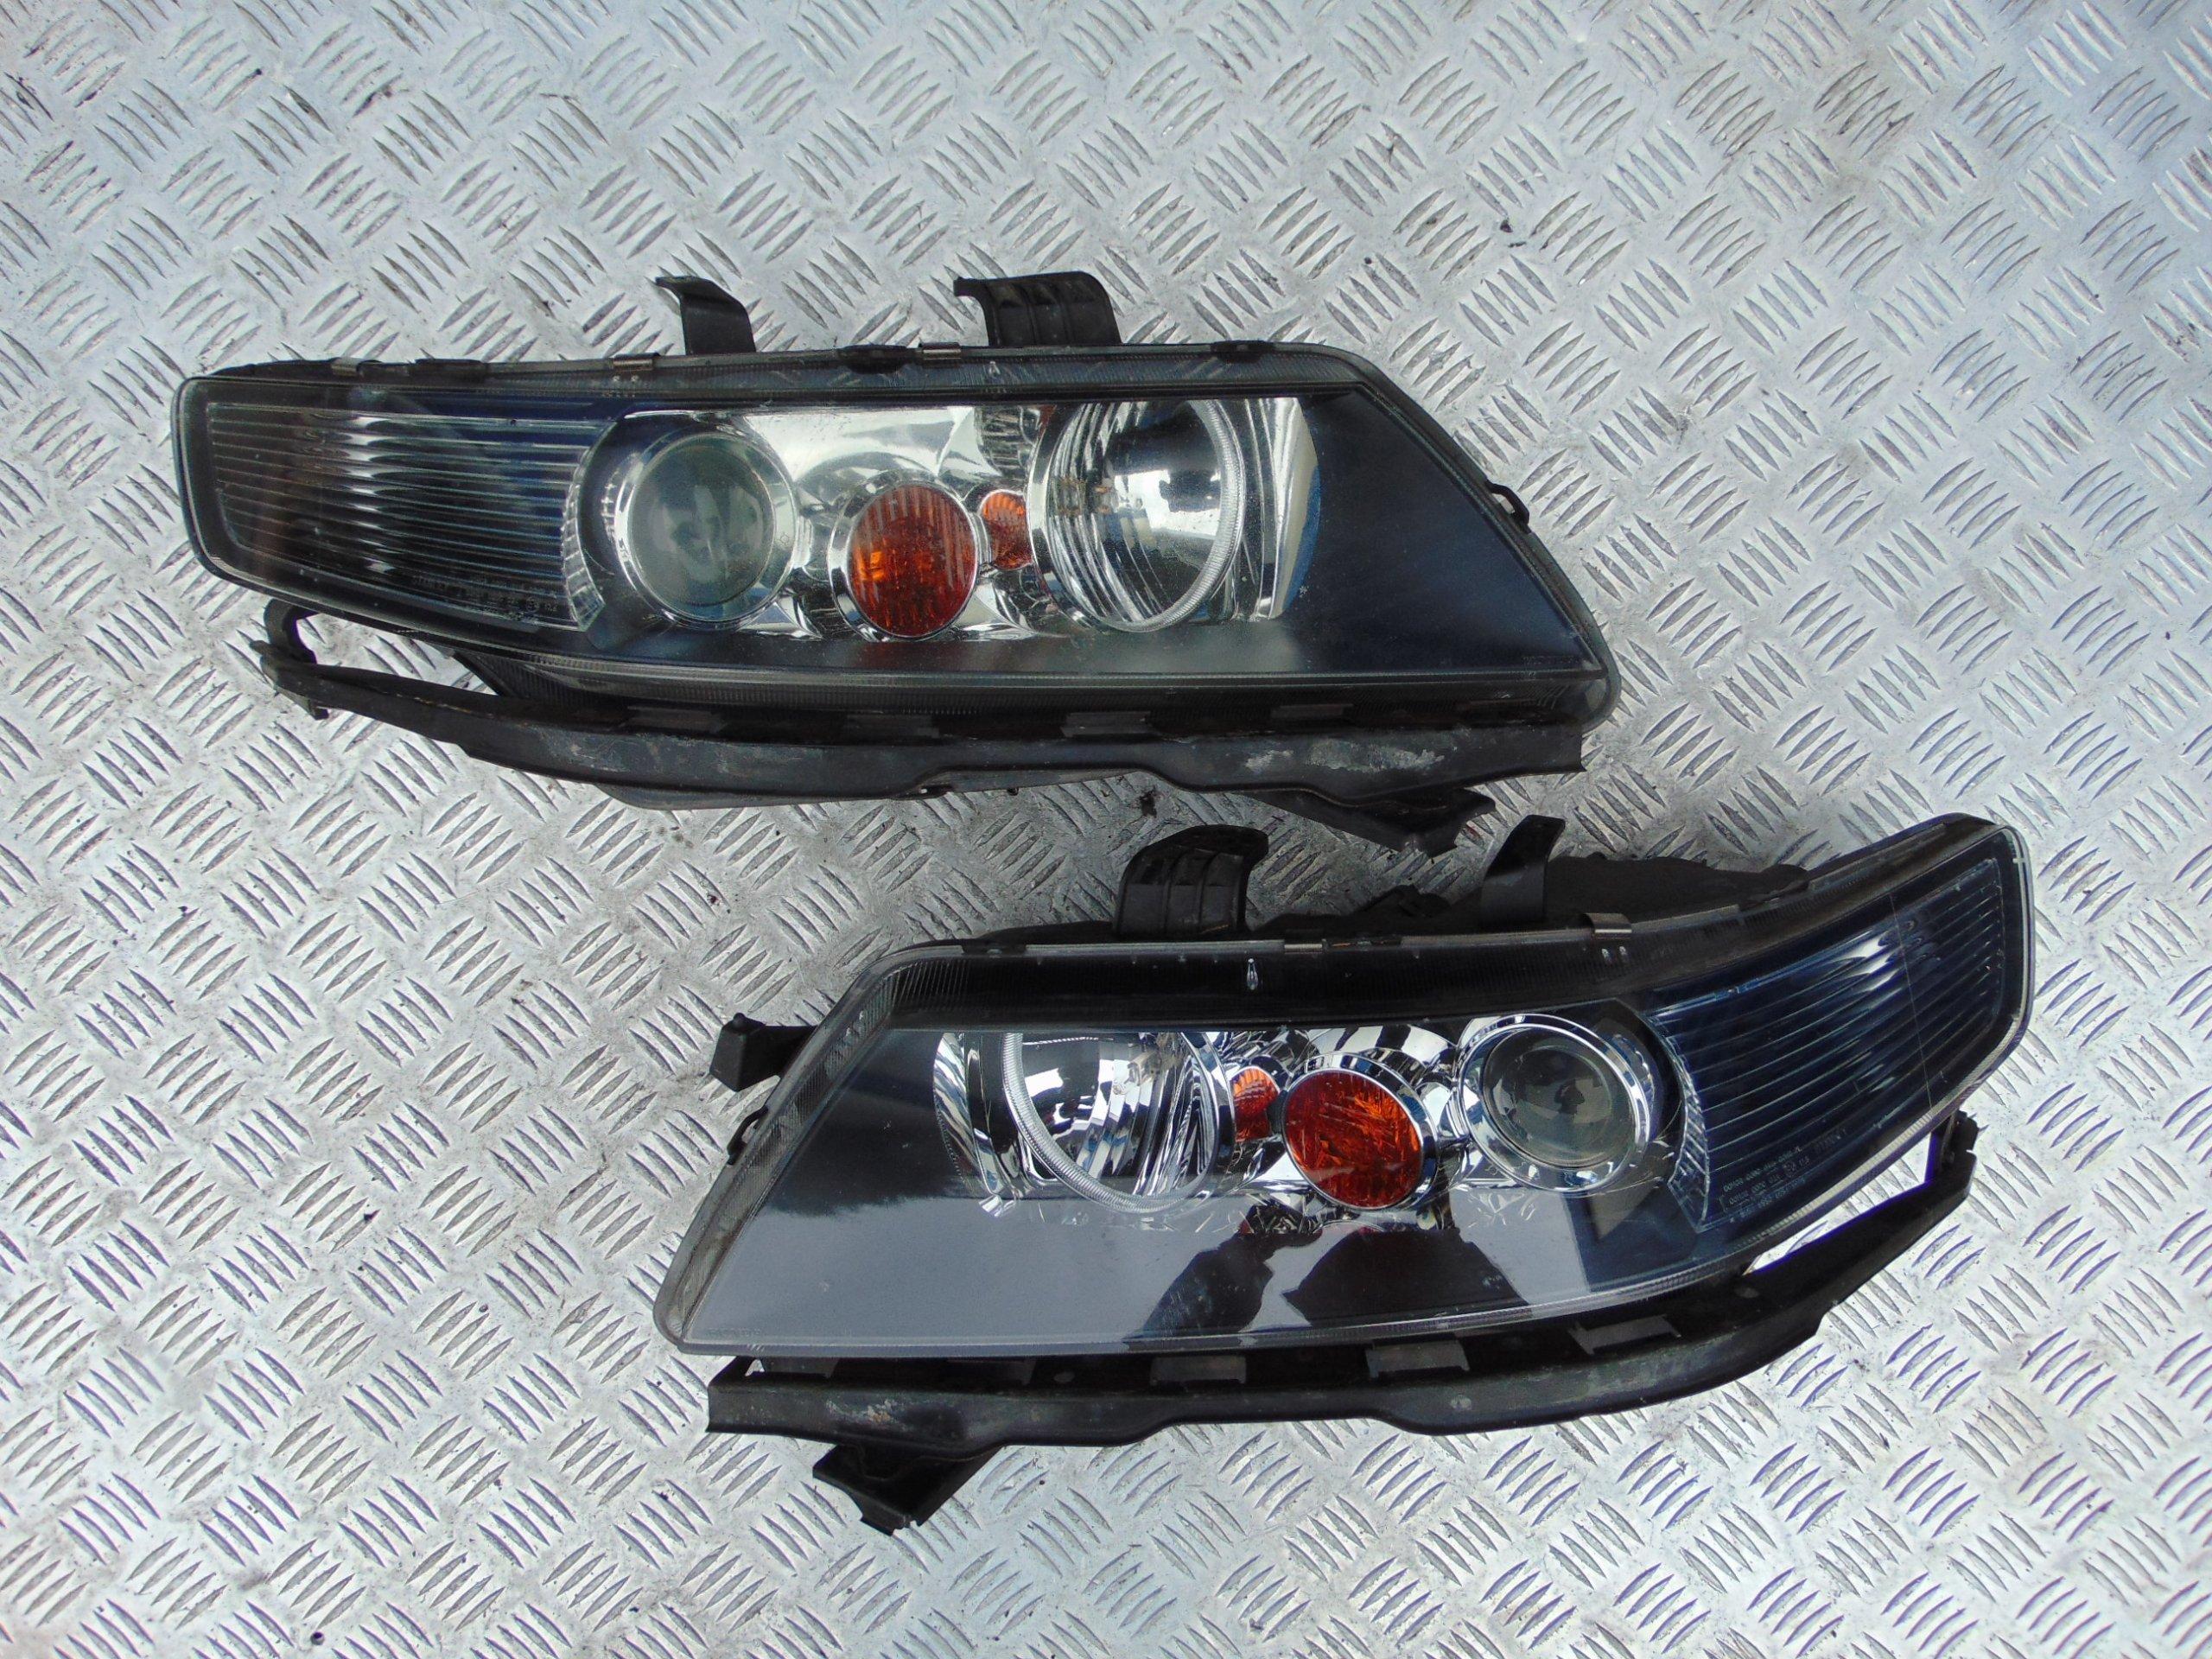 Honda Accord Vii Lampa Przednia Lewa Prawa 7174430935